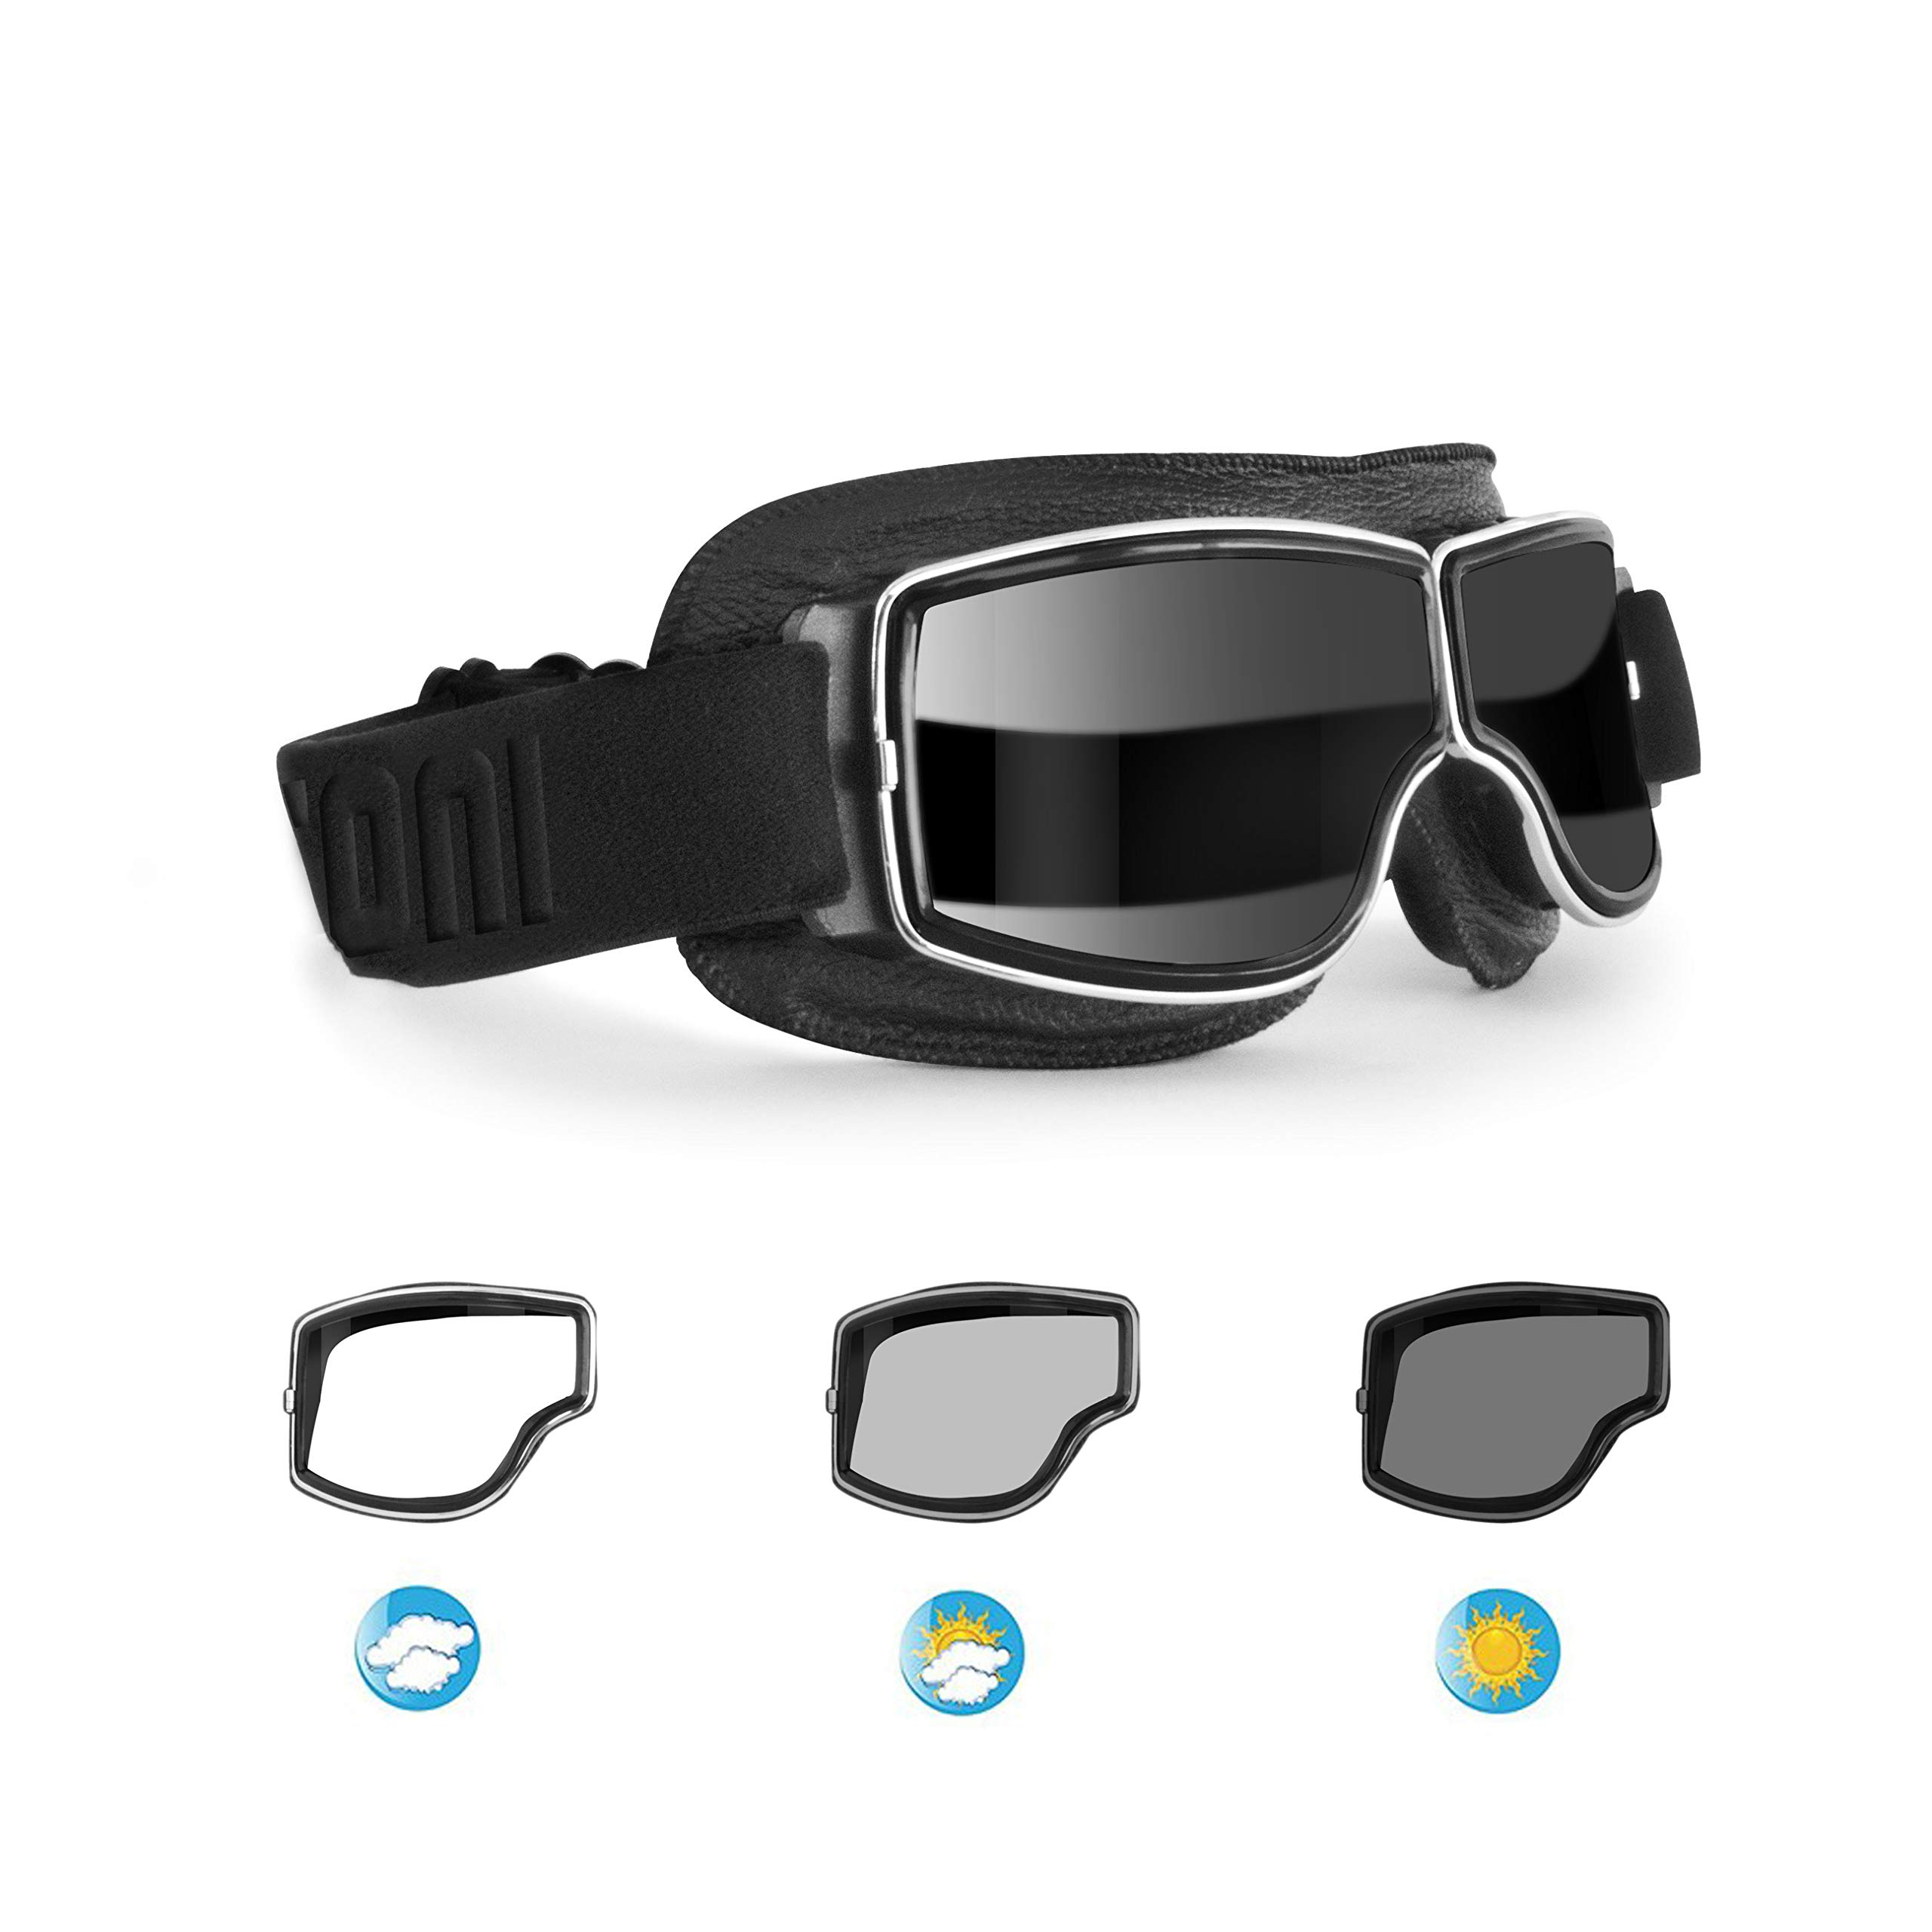 Bertoni Aviator Motorcycle Vintage Goggles Photochromic Lenses F188PH Motorbike Sunsensor Black Leather Glasses for Helmets by Bertoni